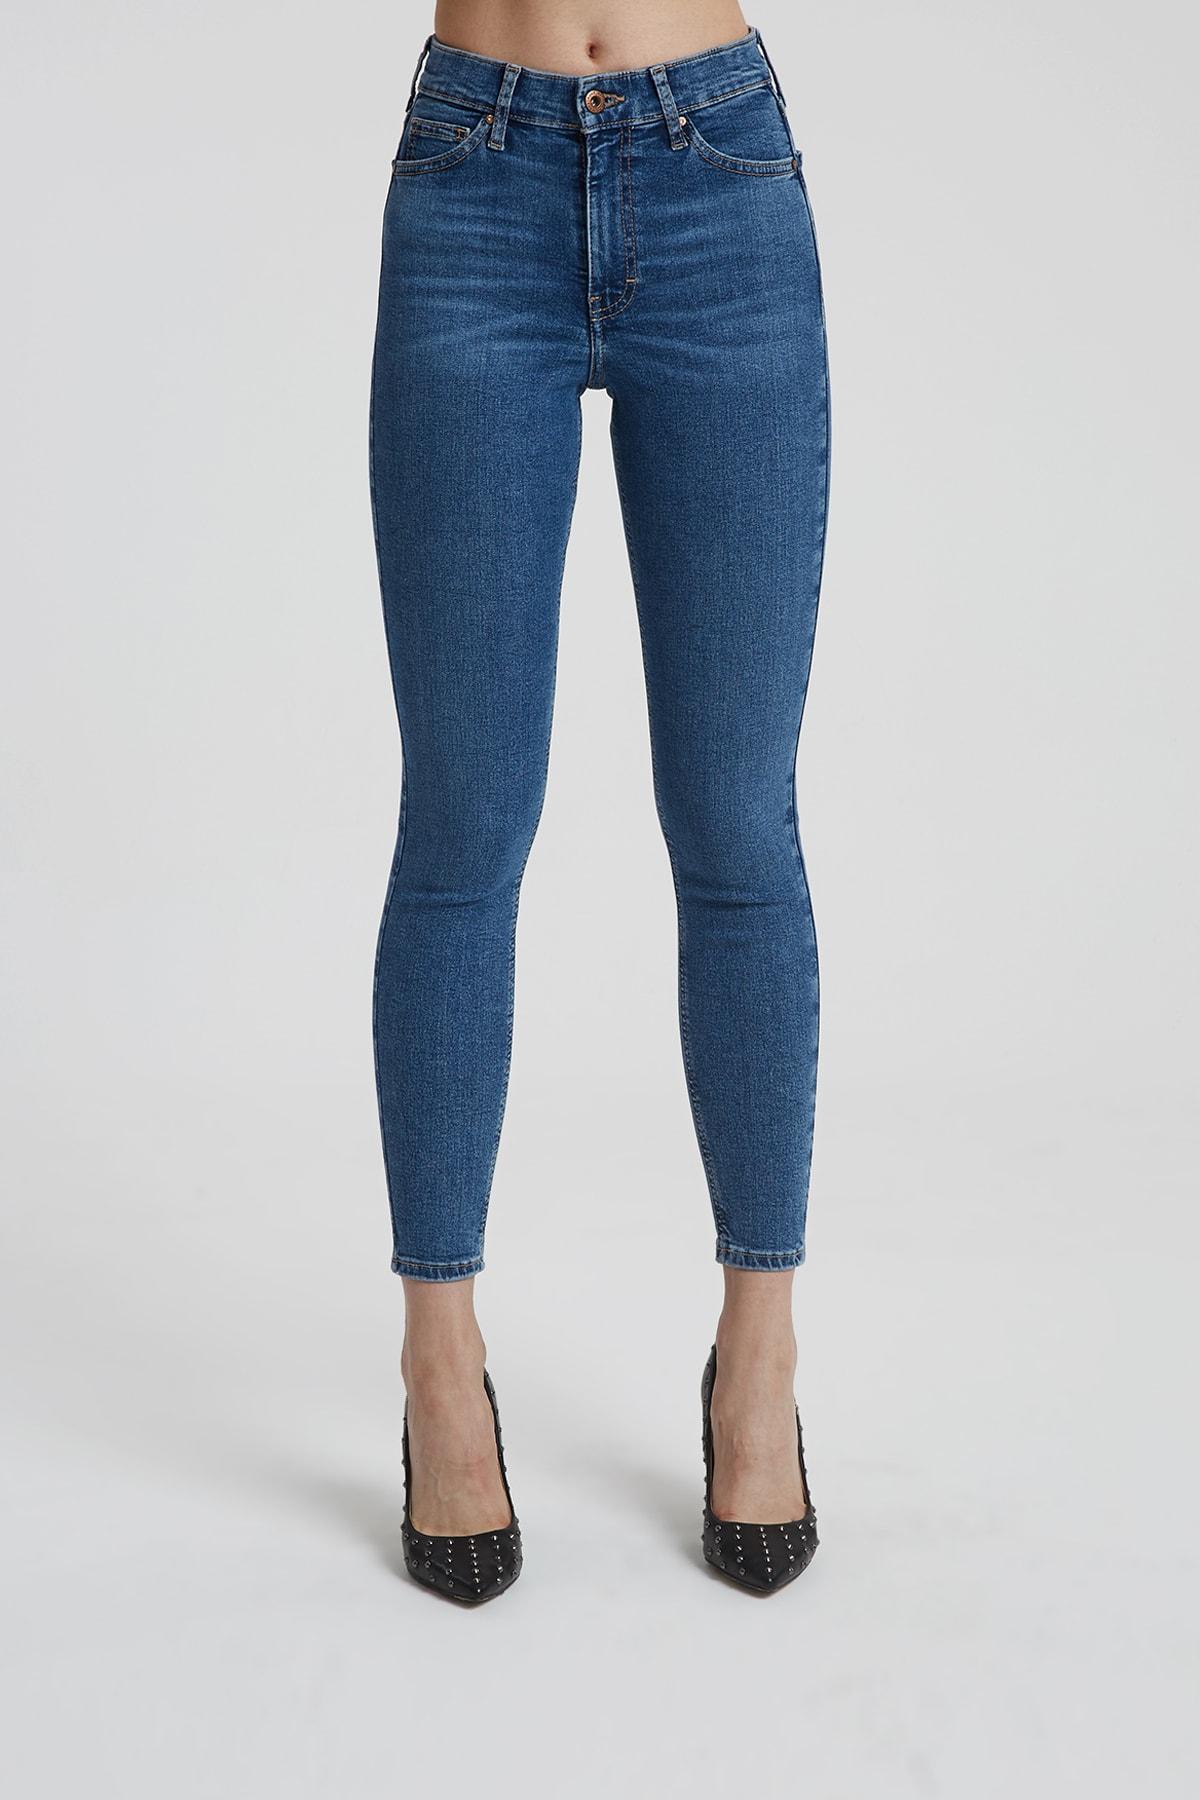 CROSS JEANS Judy Orta Taş Indigo Yüksek Bel Skinny Fit Jean Pantolon 2